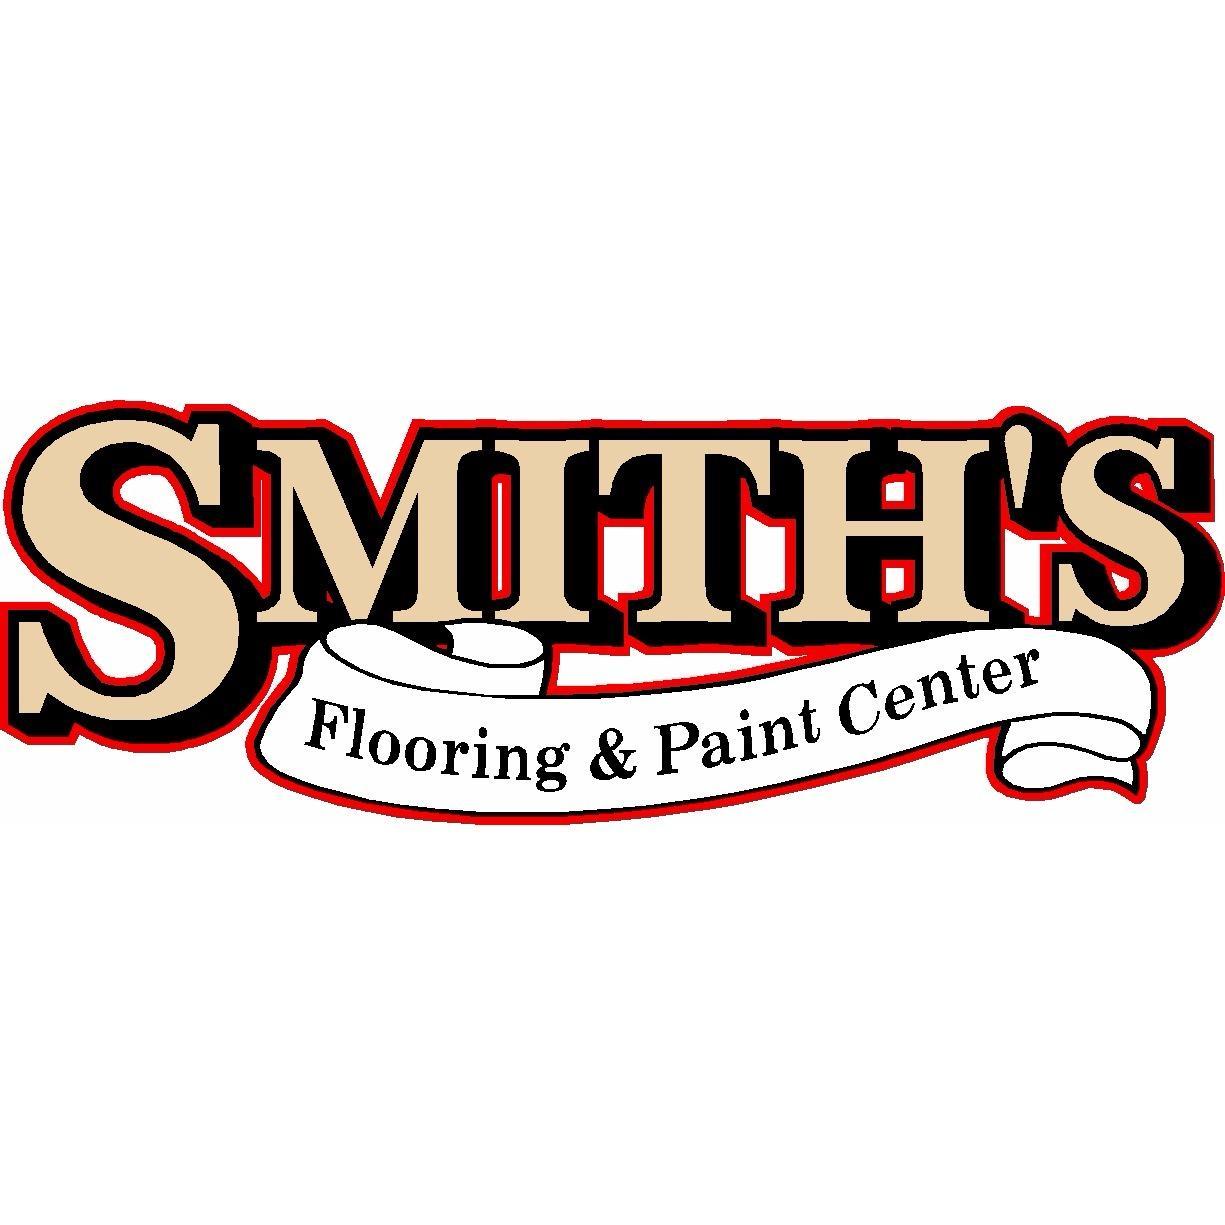 Smith's Flooring & Paint image 5